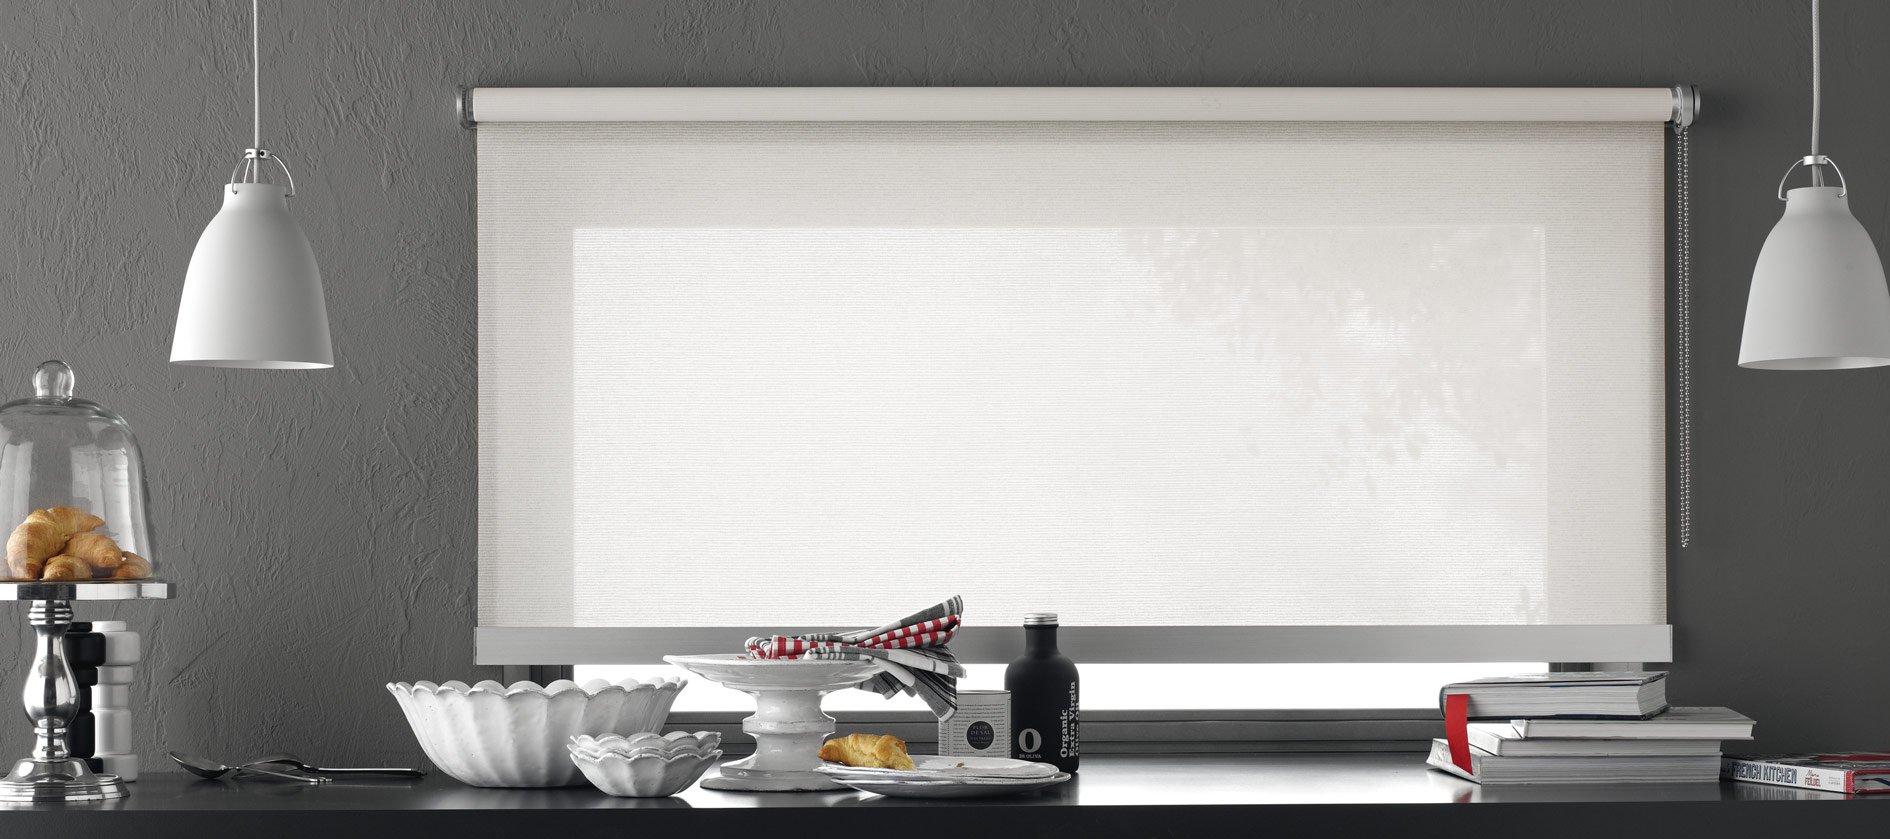 Offerte Tende Da Interno Casa.Tende Per Interni Casa Tessuti Soluzioni Colori E Offerte Online